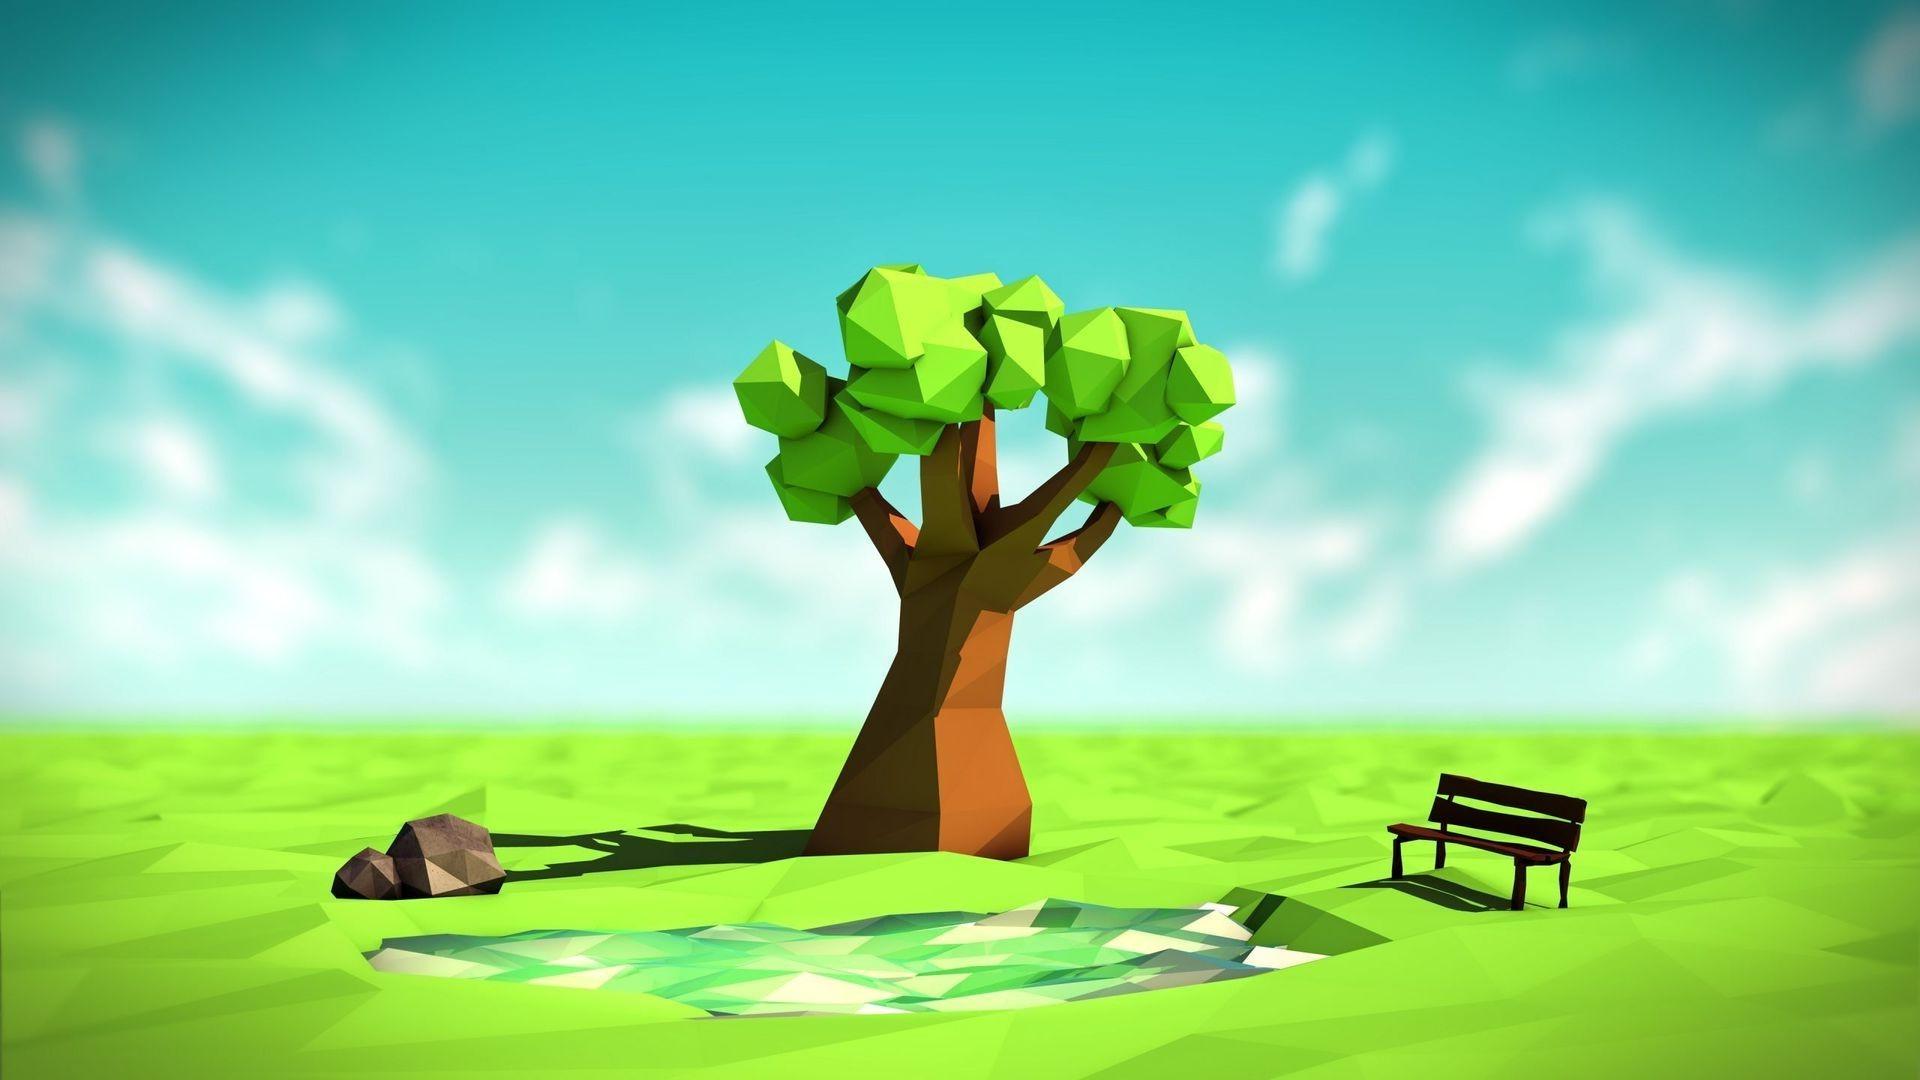 trees, illustration, digital art